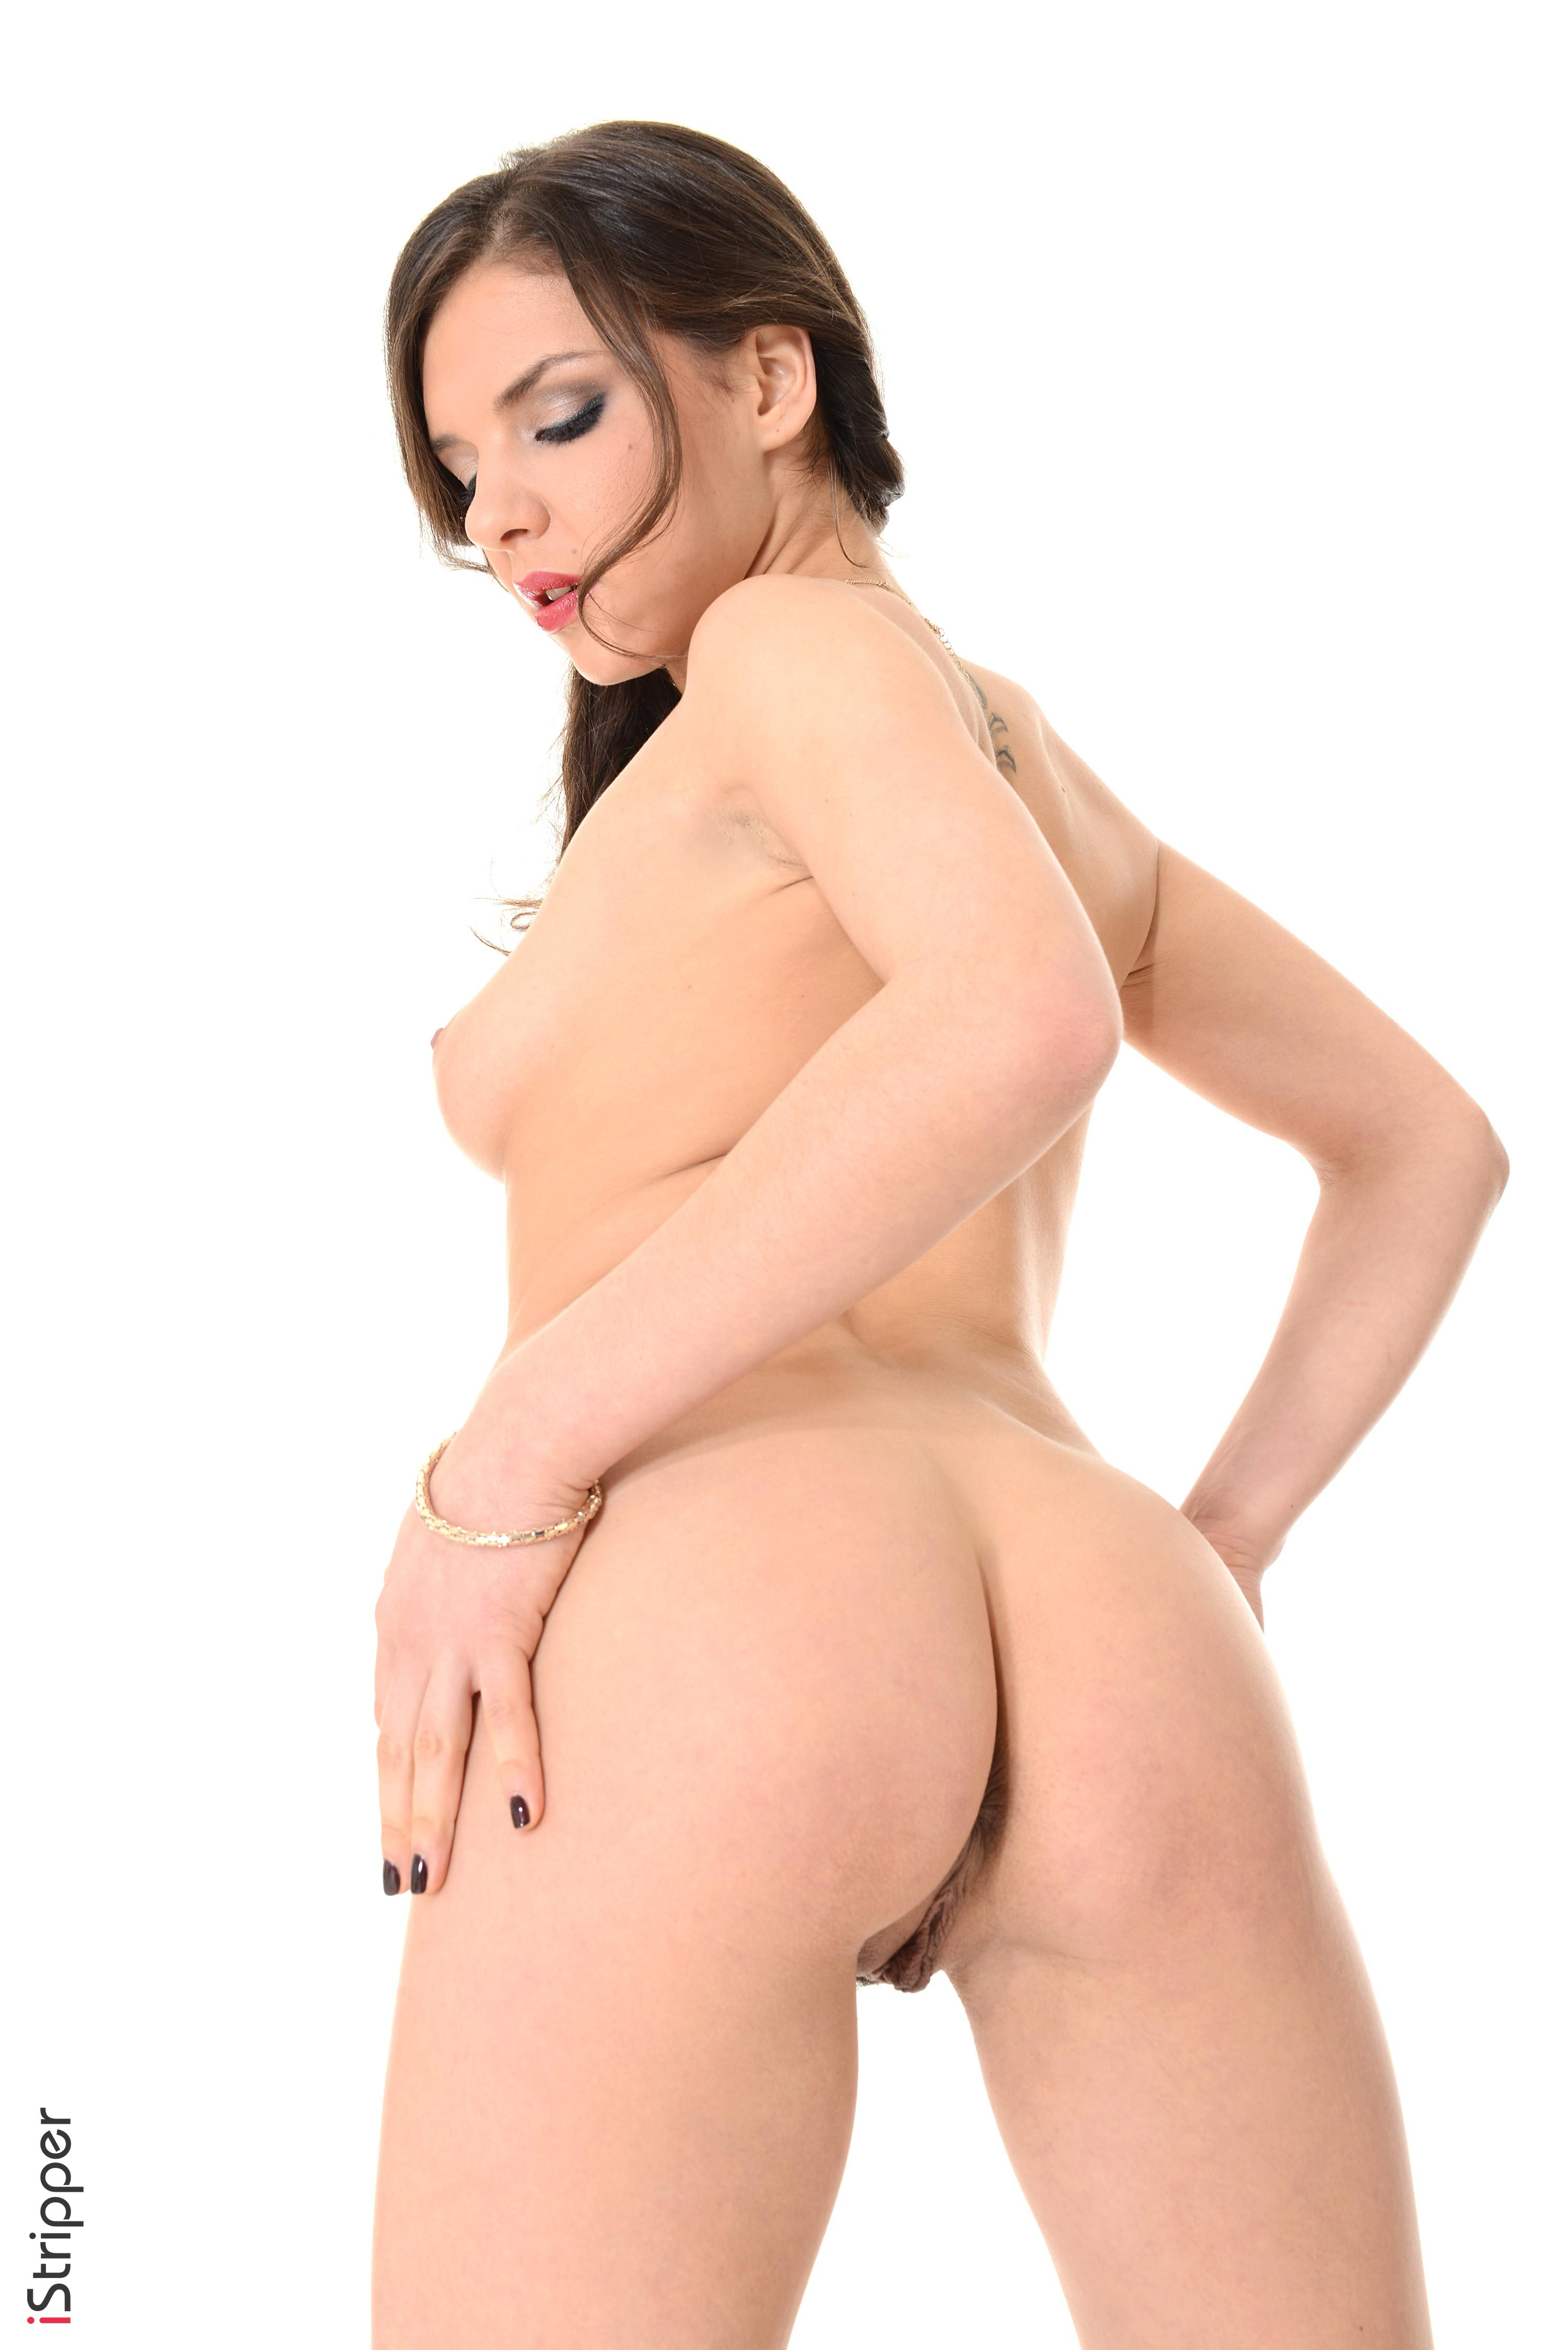 hot erotic naked women